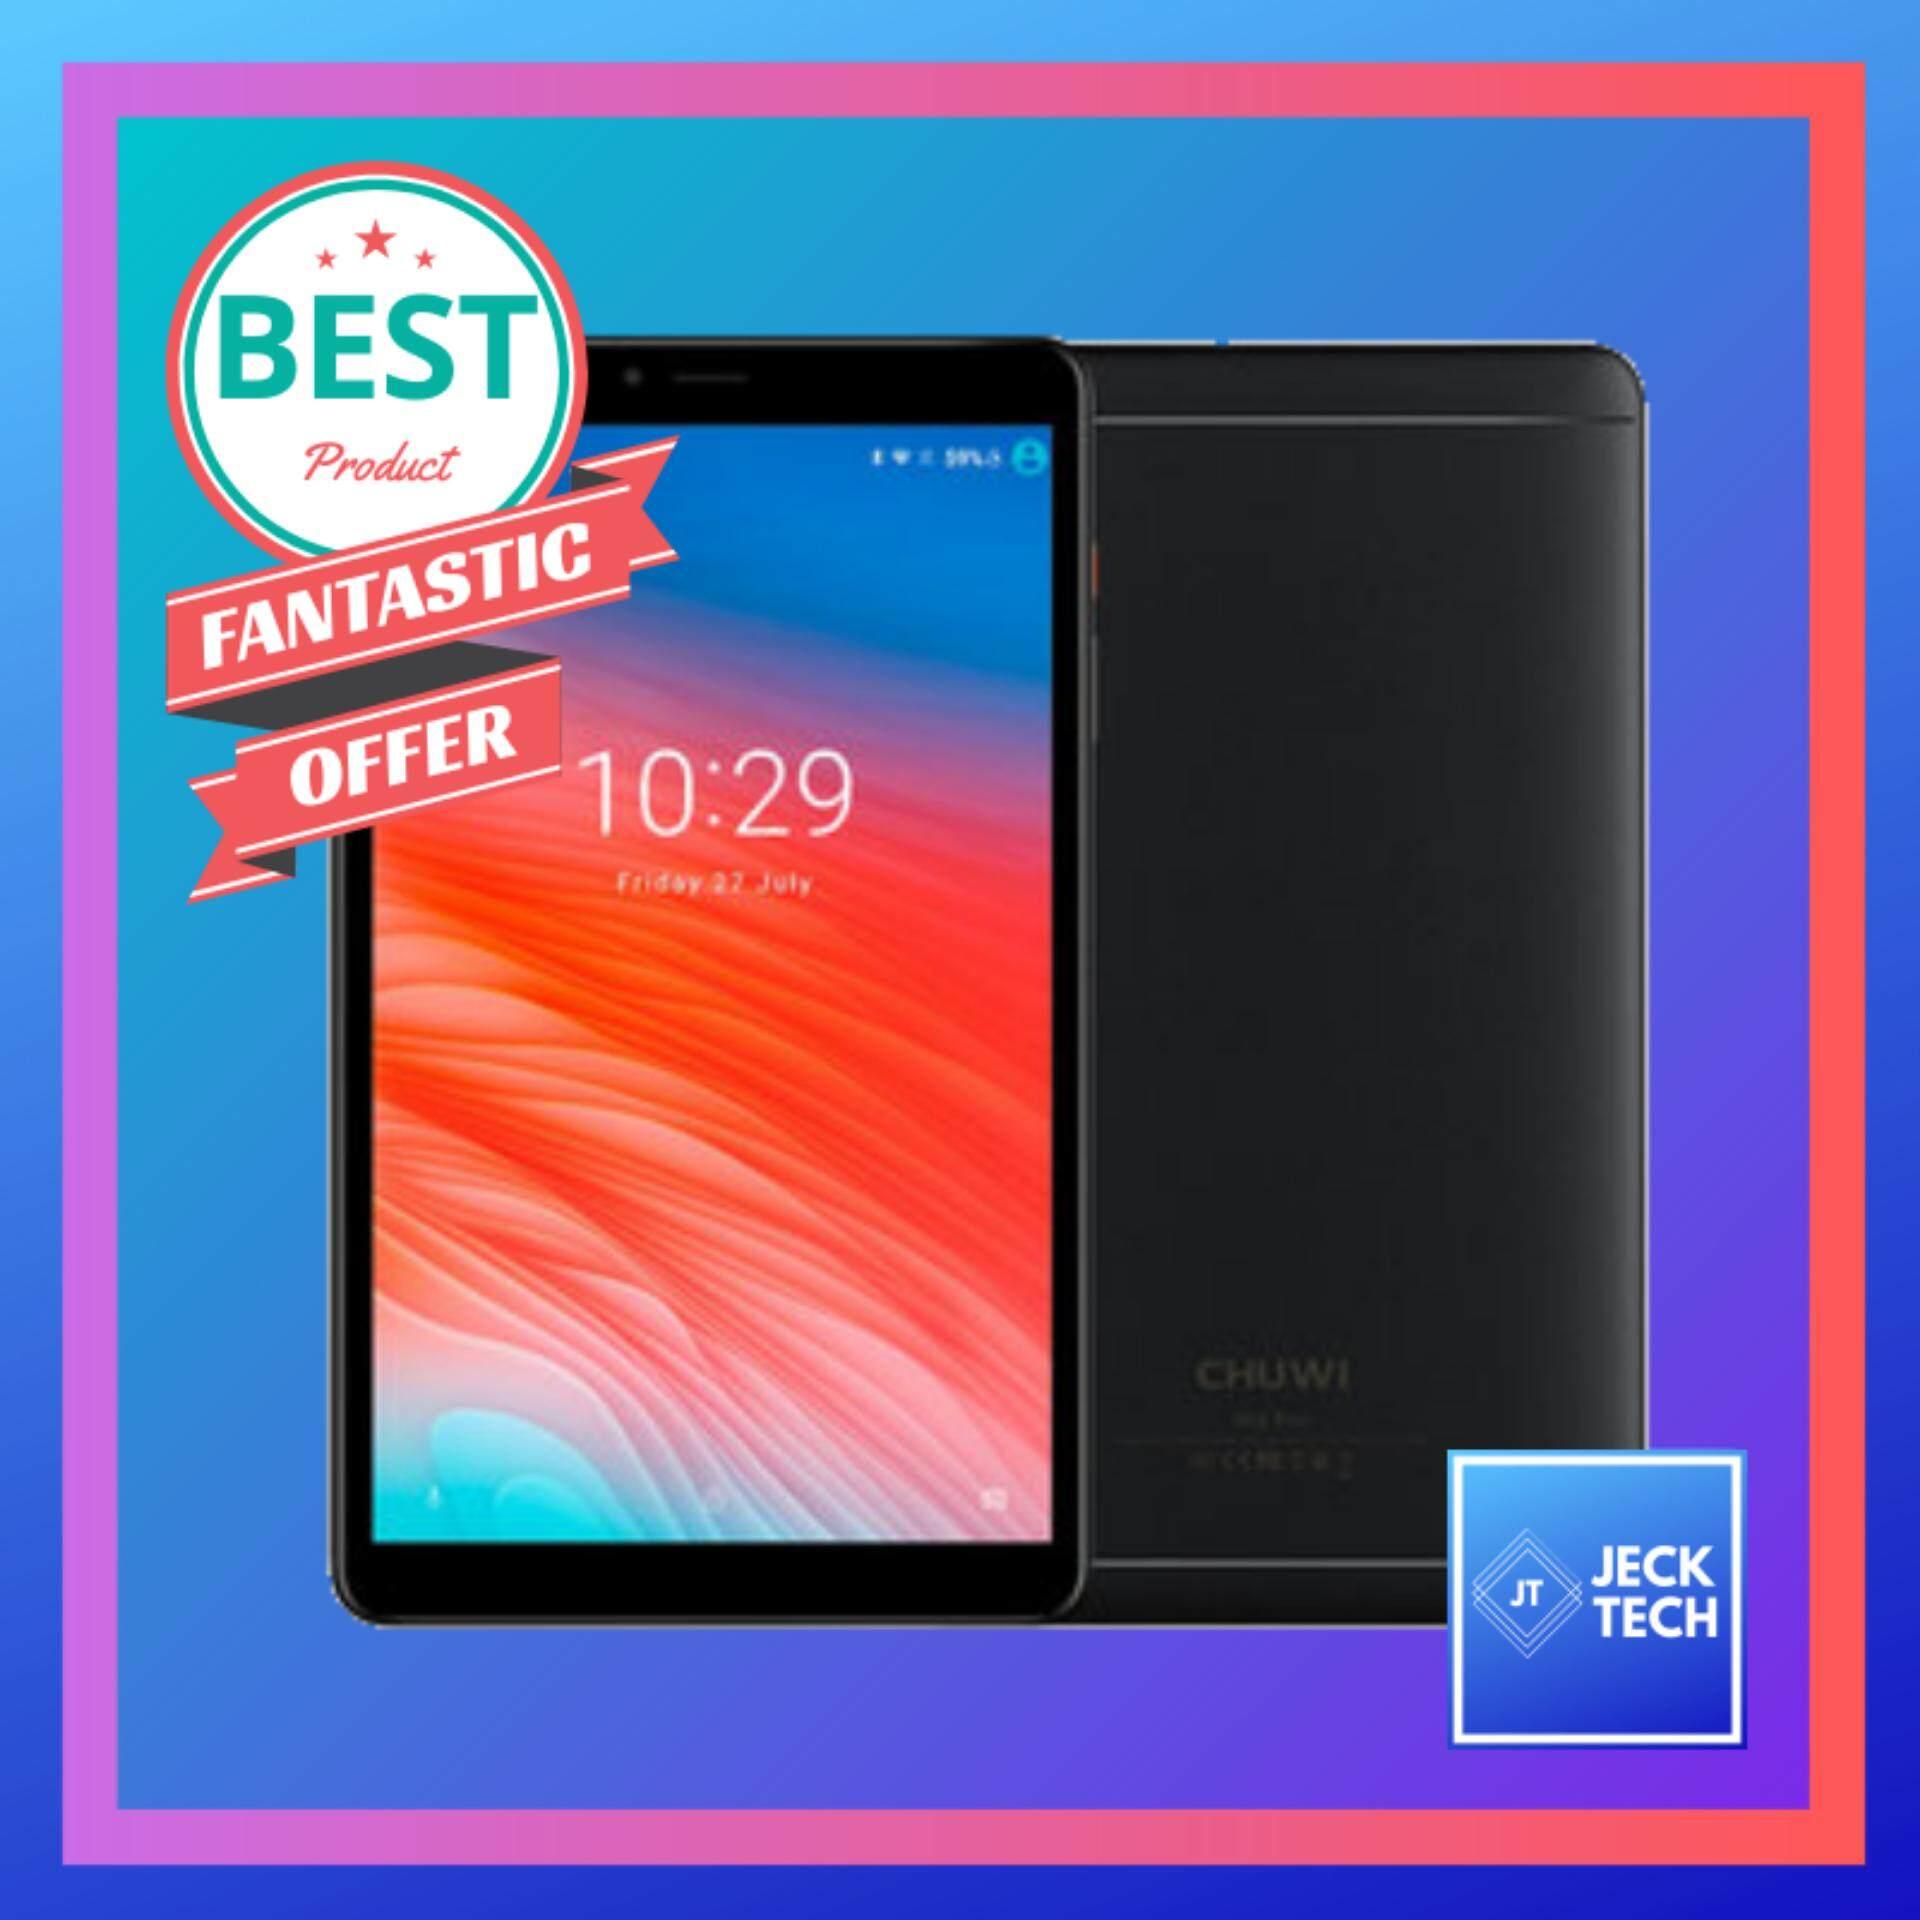 CHUWI Hi9 Pro 8.4-inch Tablet PC Deco Core CPU, GPU, 3GB+32GB, Dual Sim Card Slot